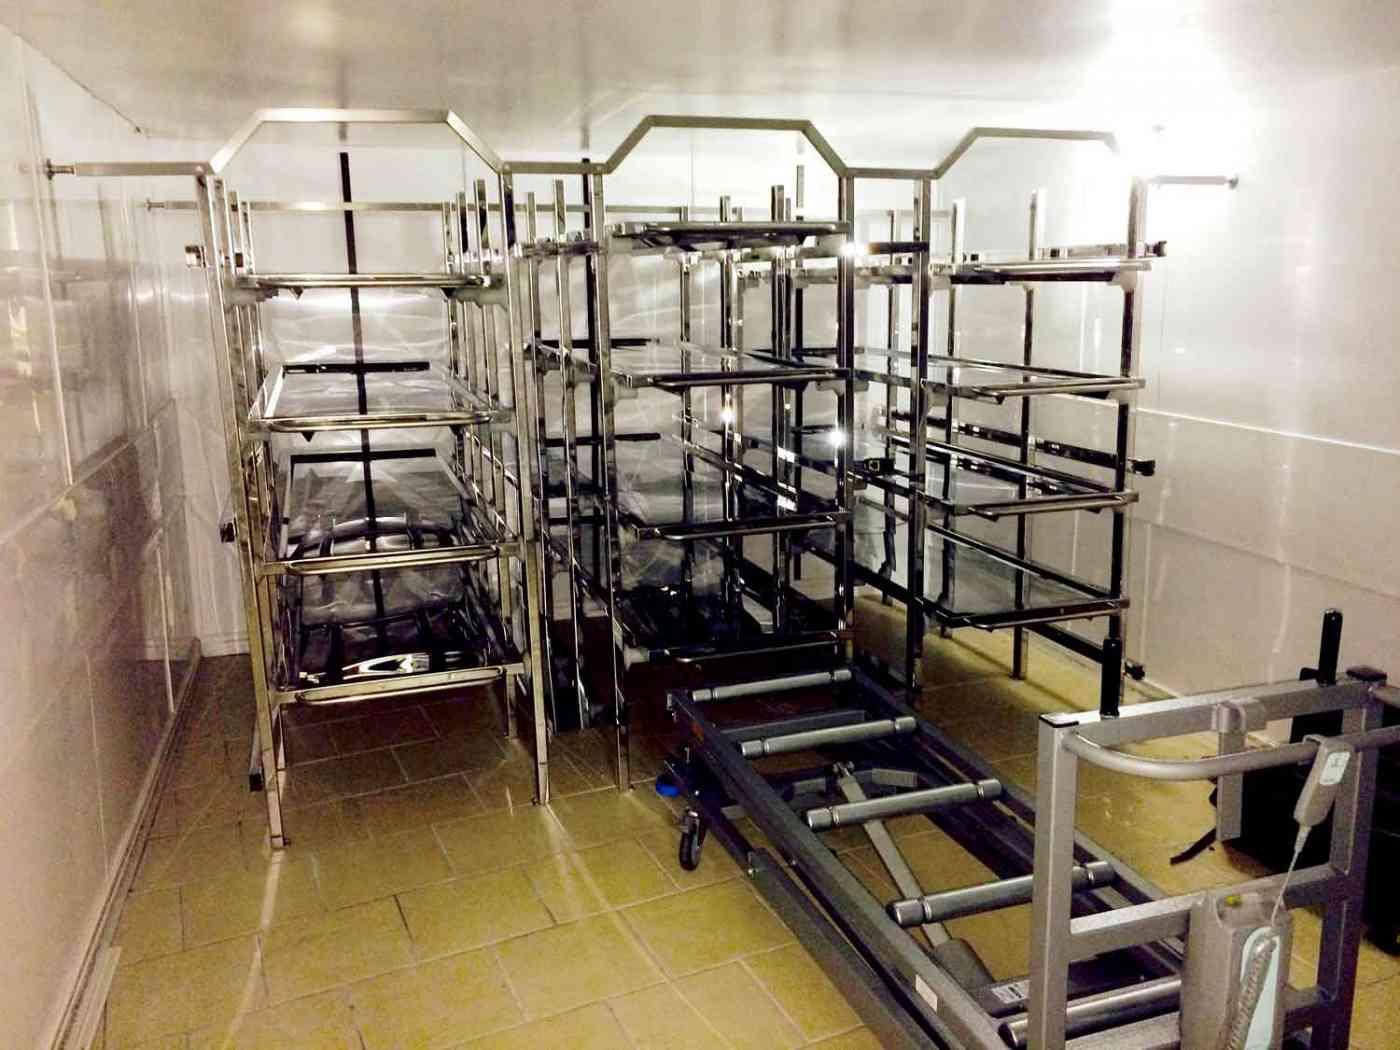 Body Racking System, Autopsy, Mortuary, Post Mortem, Funeral Equipment WJ Kenyon